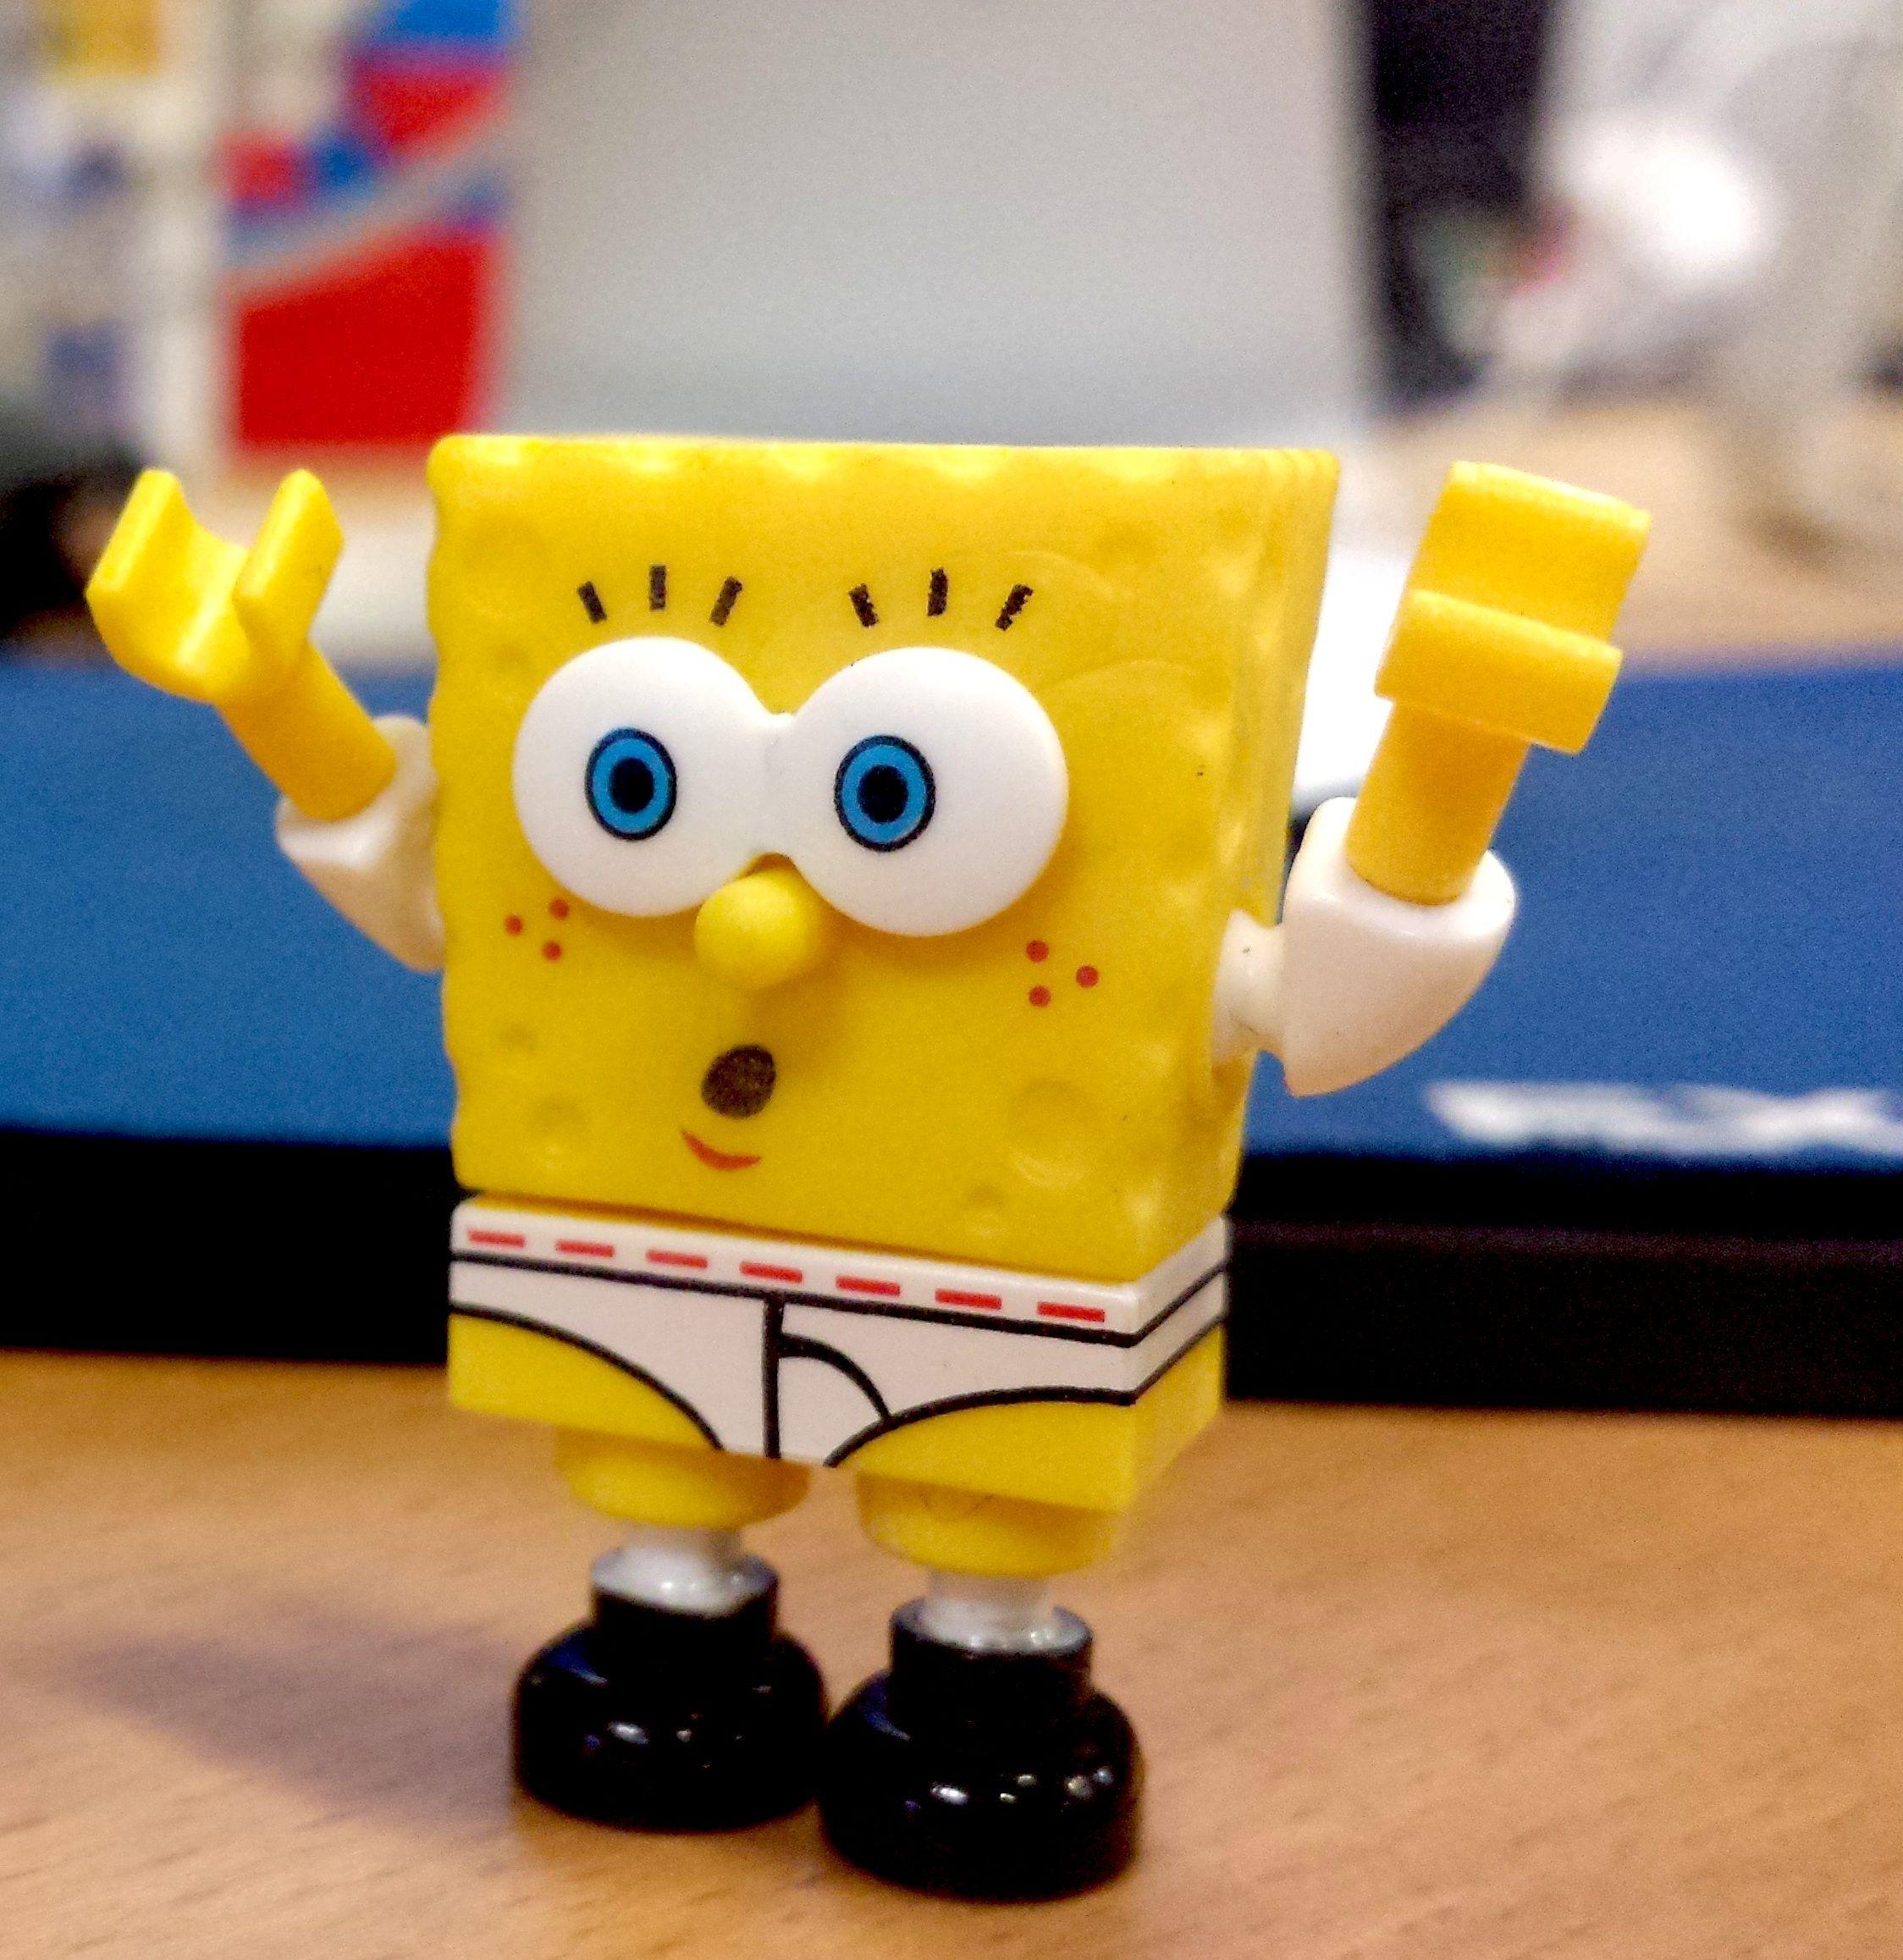 d57e2991435218 Oops! This SpongeBob Mega Bloks figure forgot to wear pants today ...